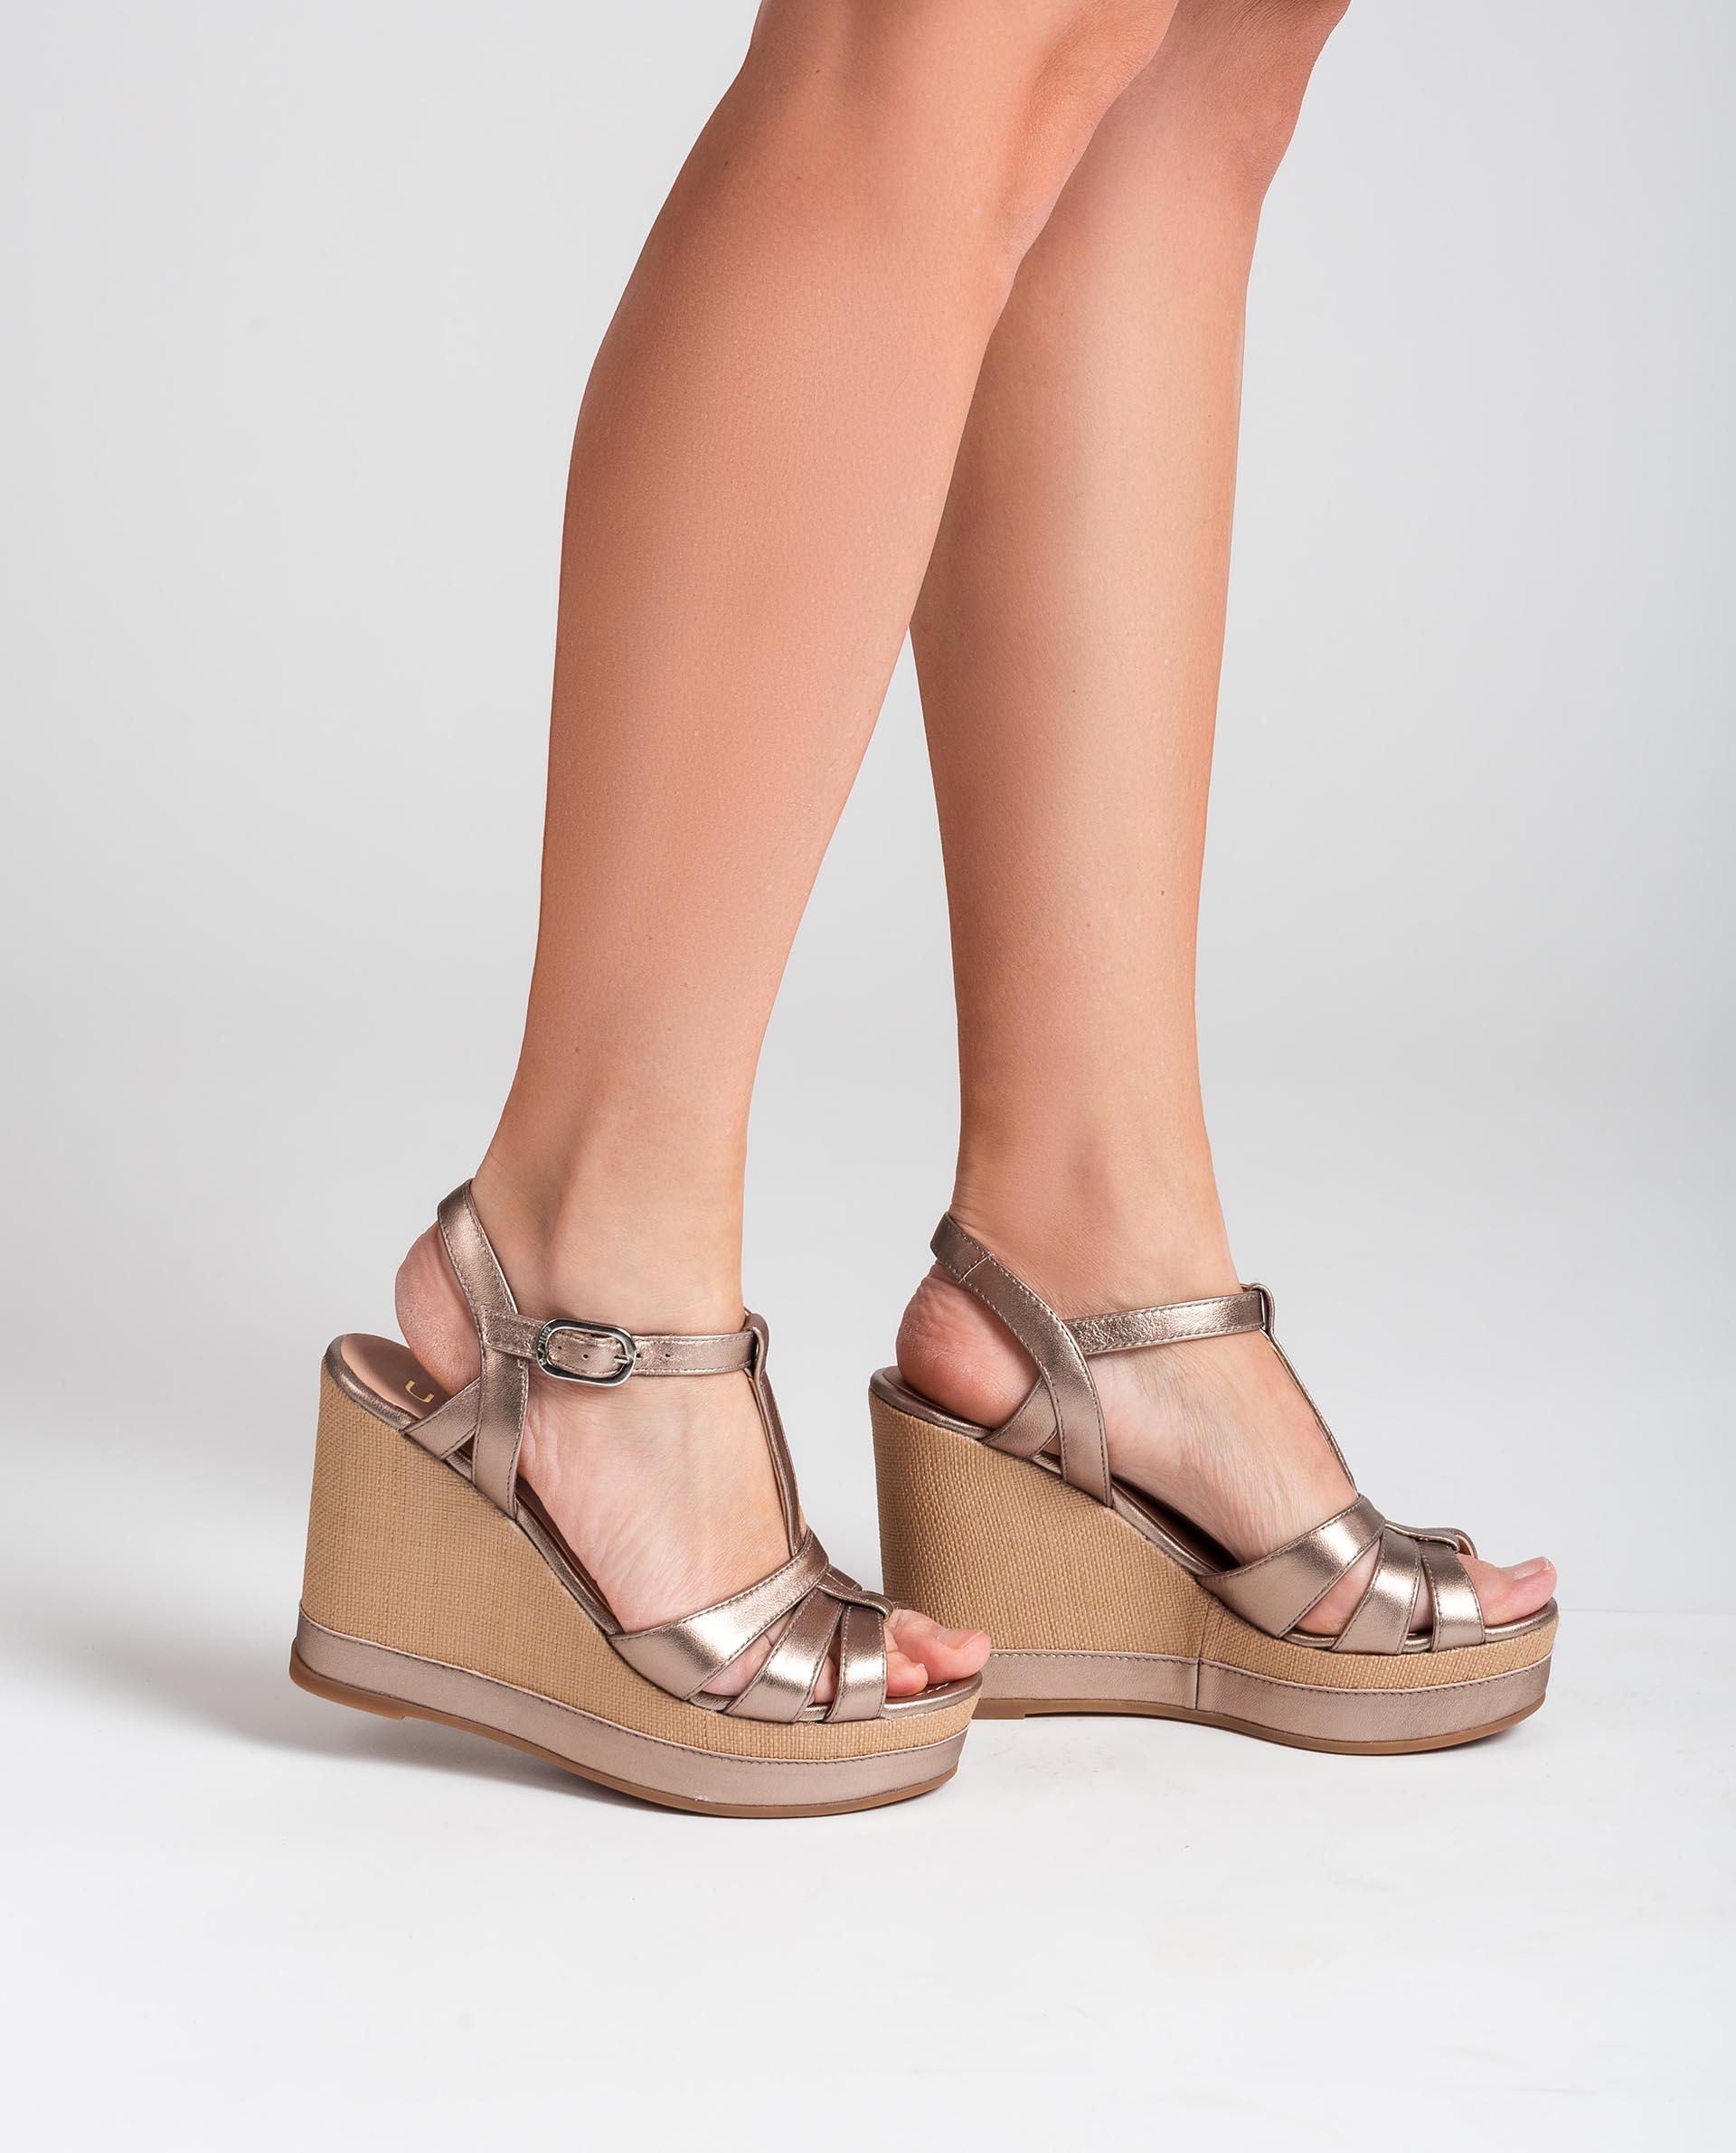 UNISA T-Strap-Sandalen aus Leder in Metallic-Optik MANACOR_LMT 5